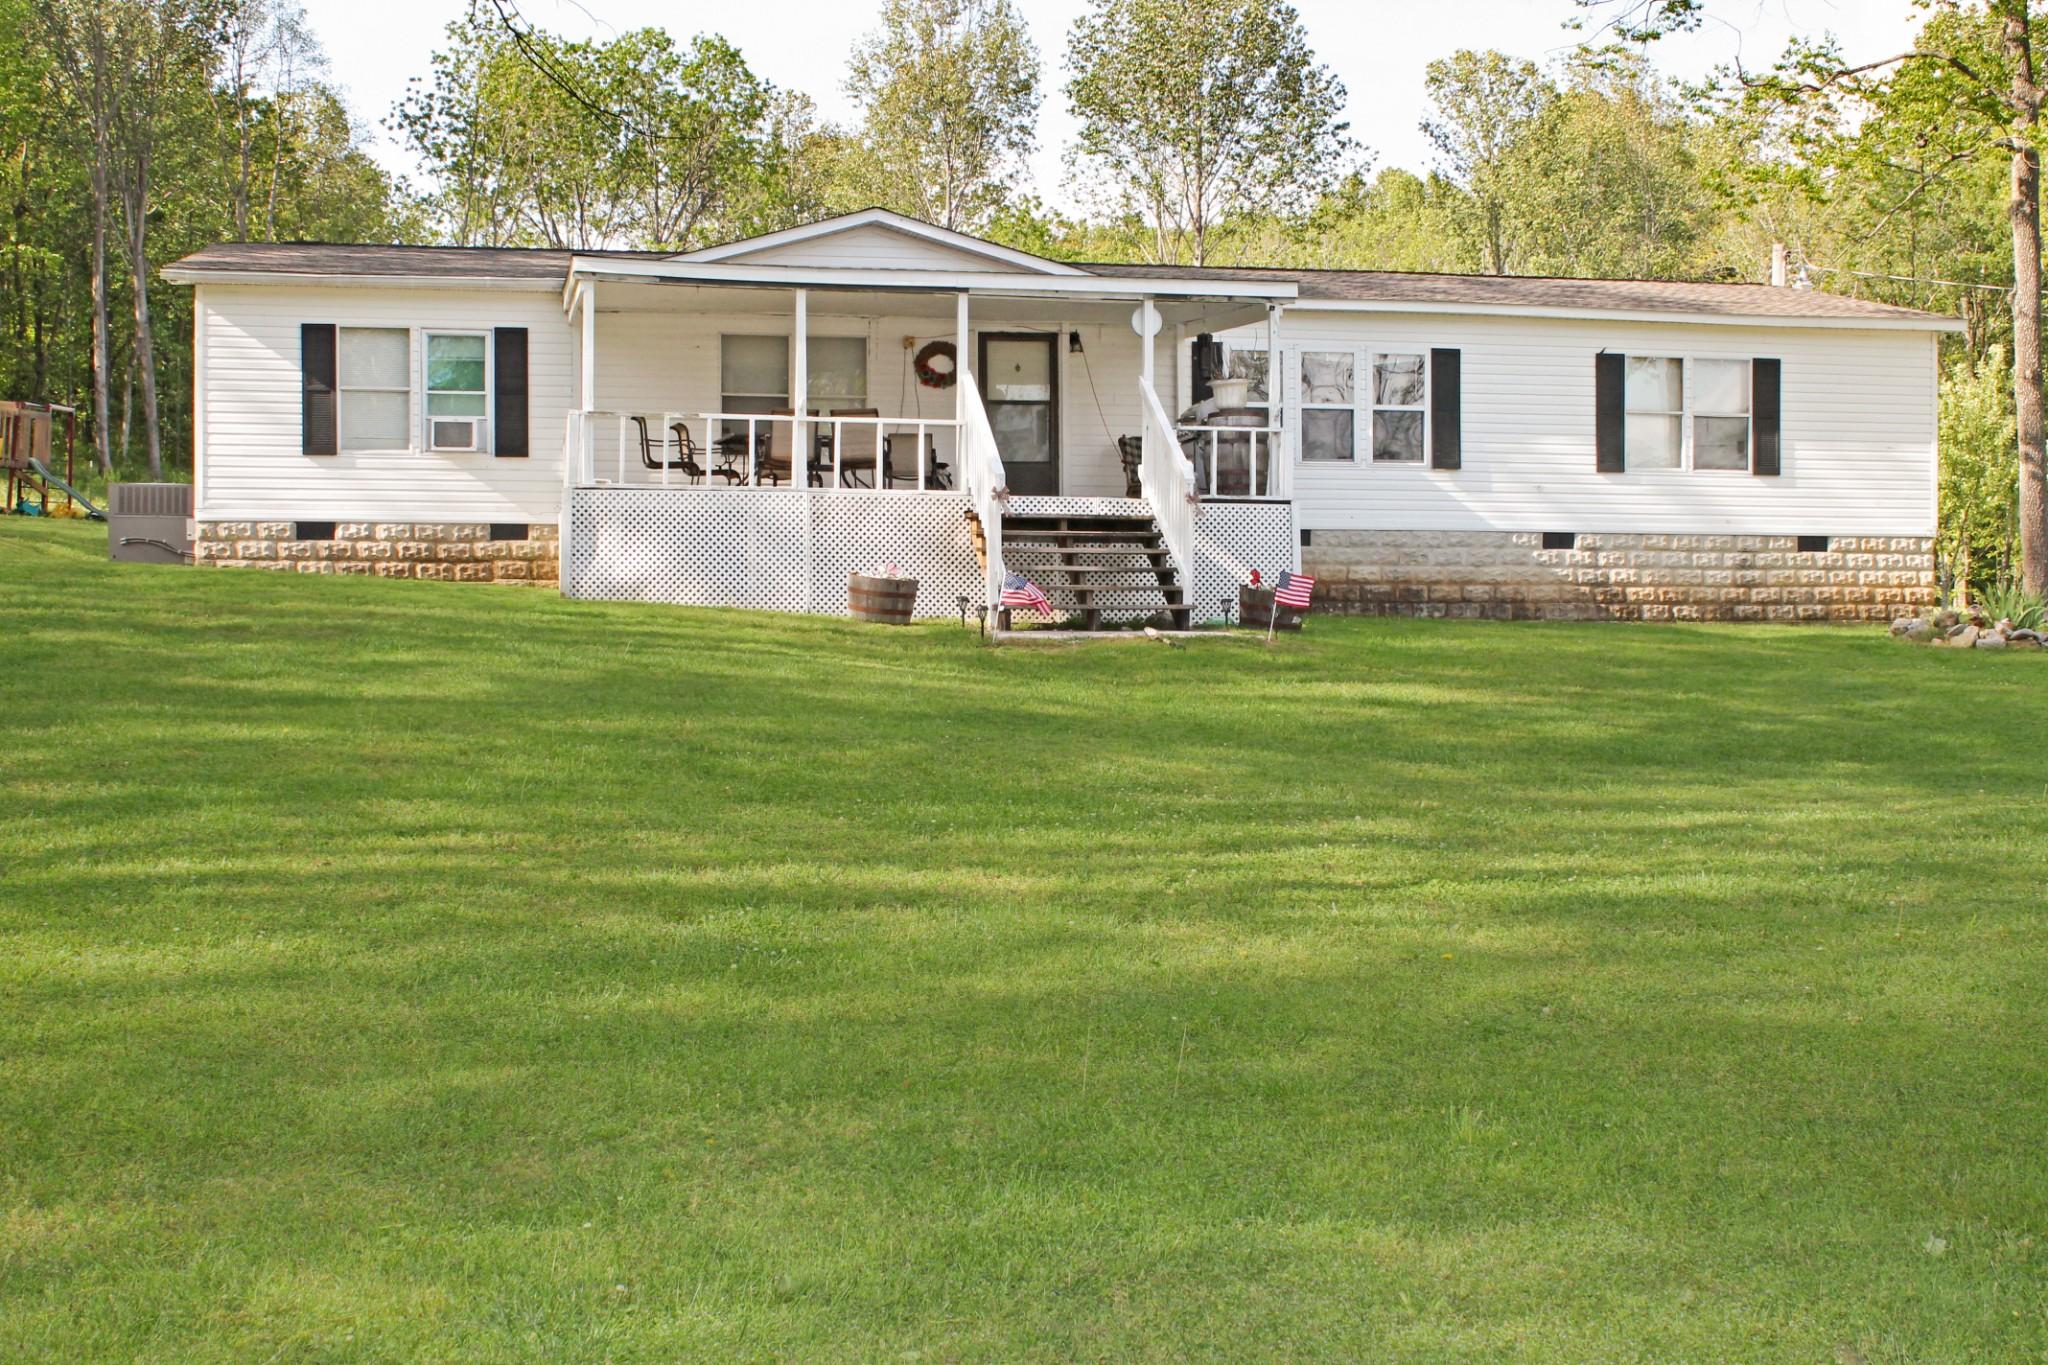 1299 Little Mountain Rd, Hillsboro, TN 37342 - Hillsboro, TN real estate listing